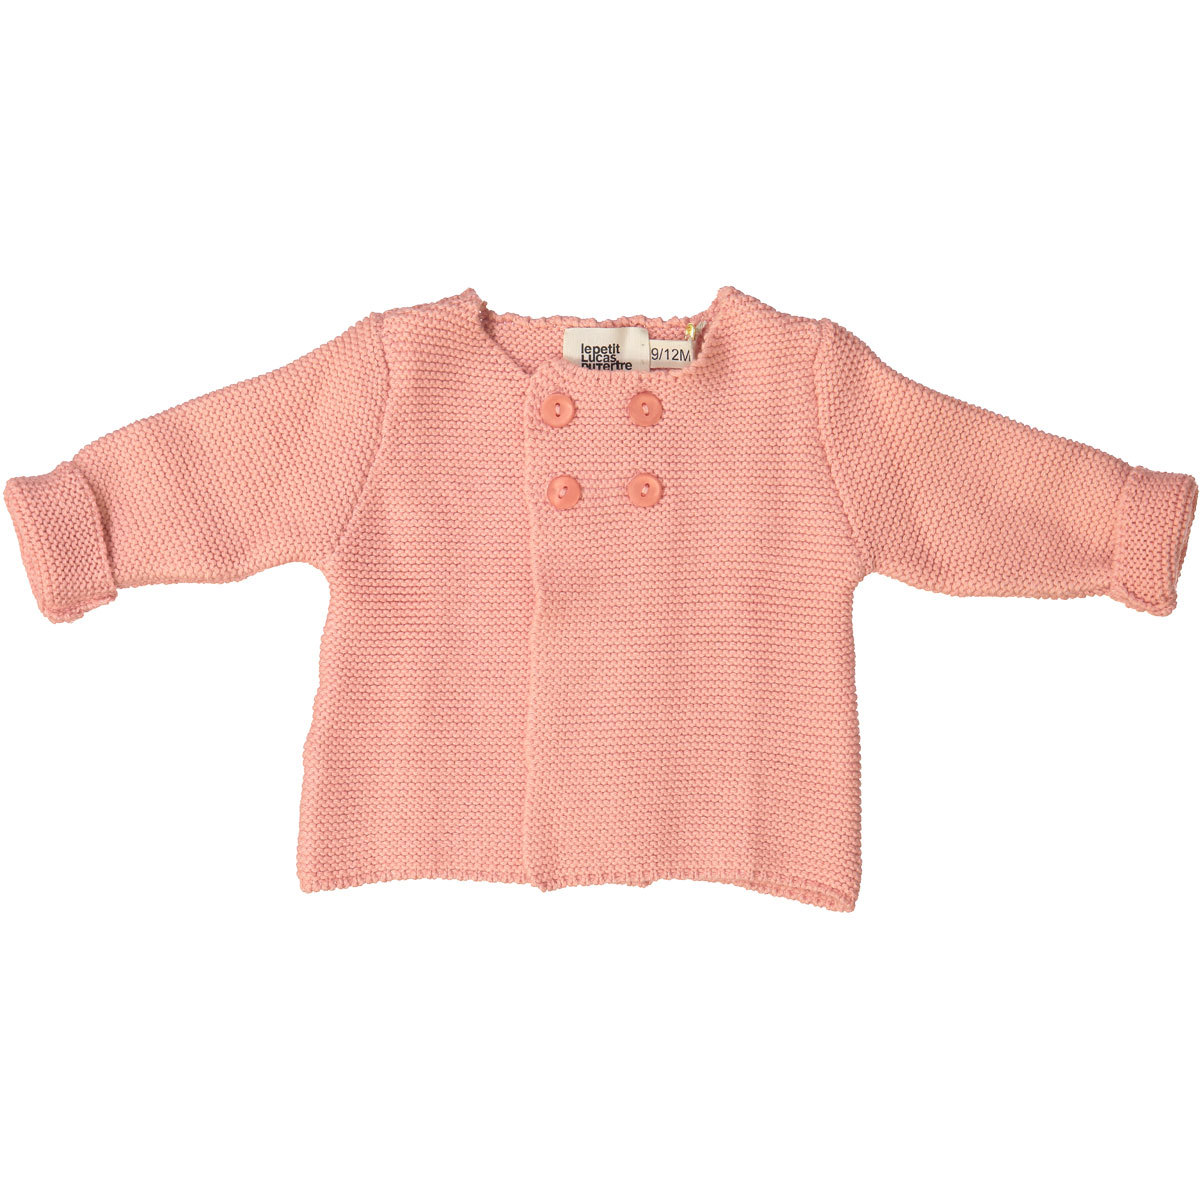 Hauts bébé Cardigan Julia - Rose - 6/9 Mois Cardigan Julia - Rose - 6/9 Mois